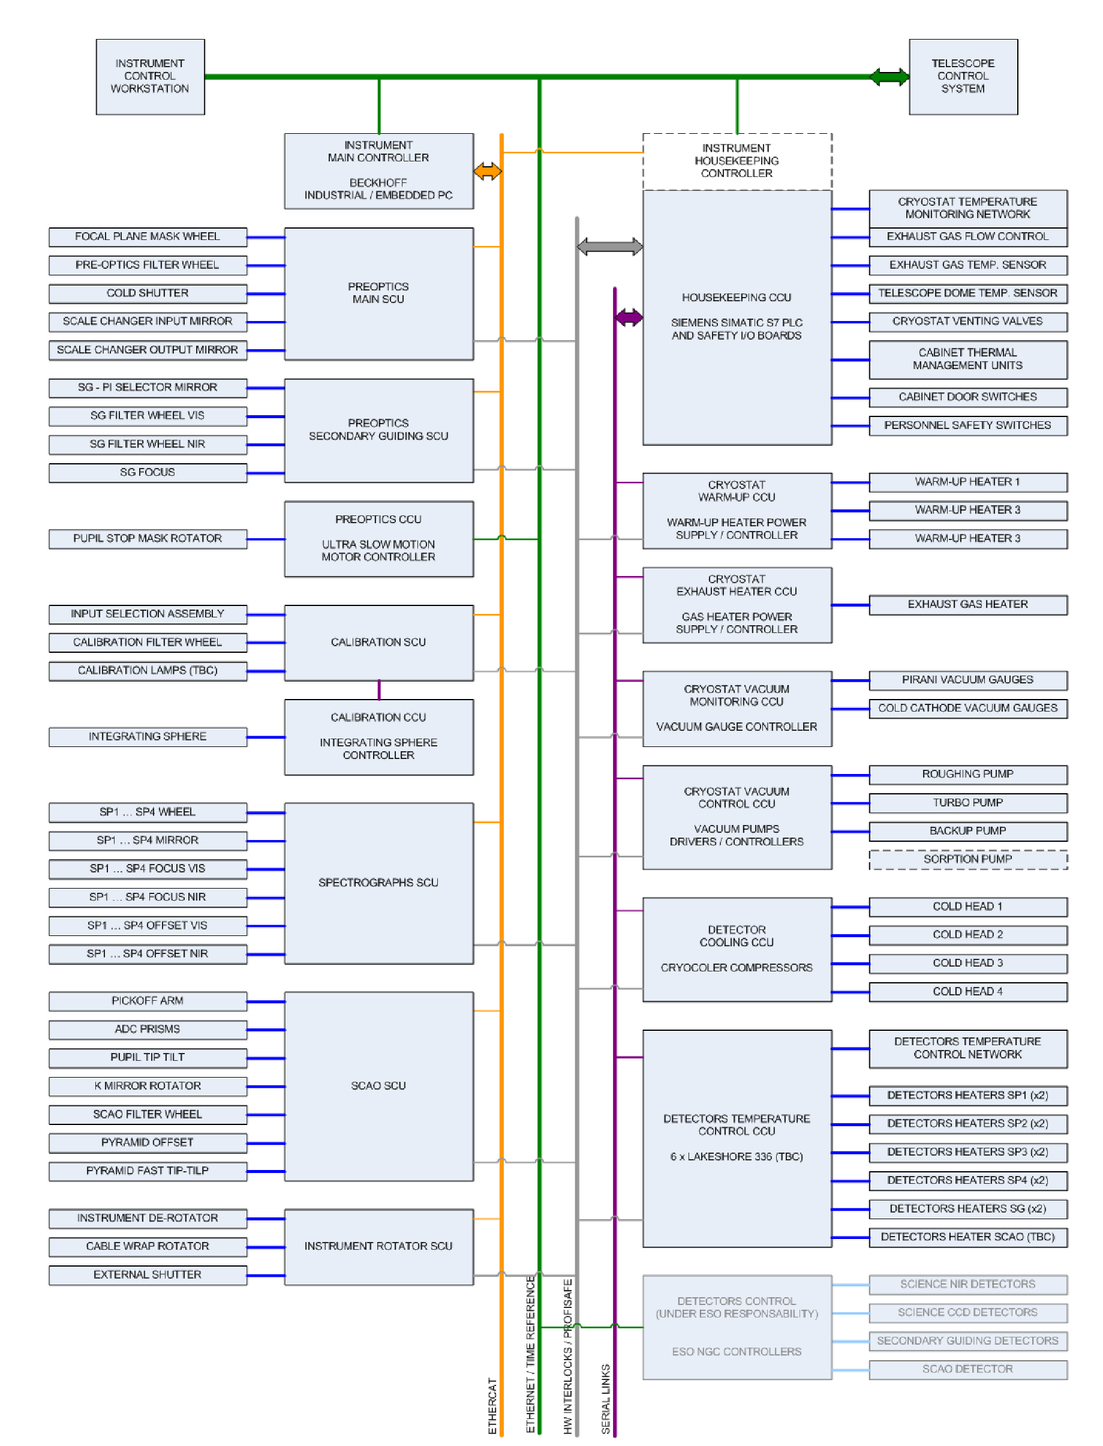 Harmoni Instrument Control Electronics Beckhoff Wiring Diagram 00271 Psisdg9147 91478v Page 10 1